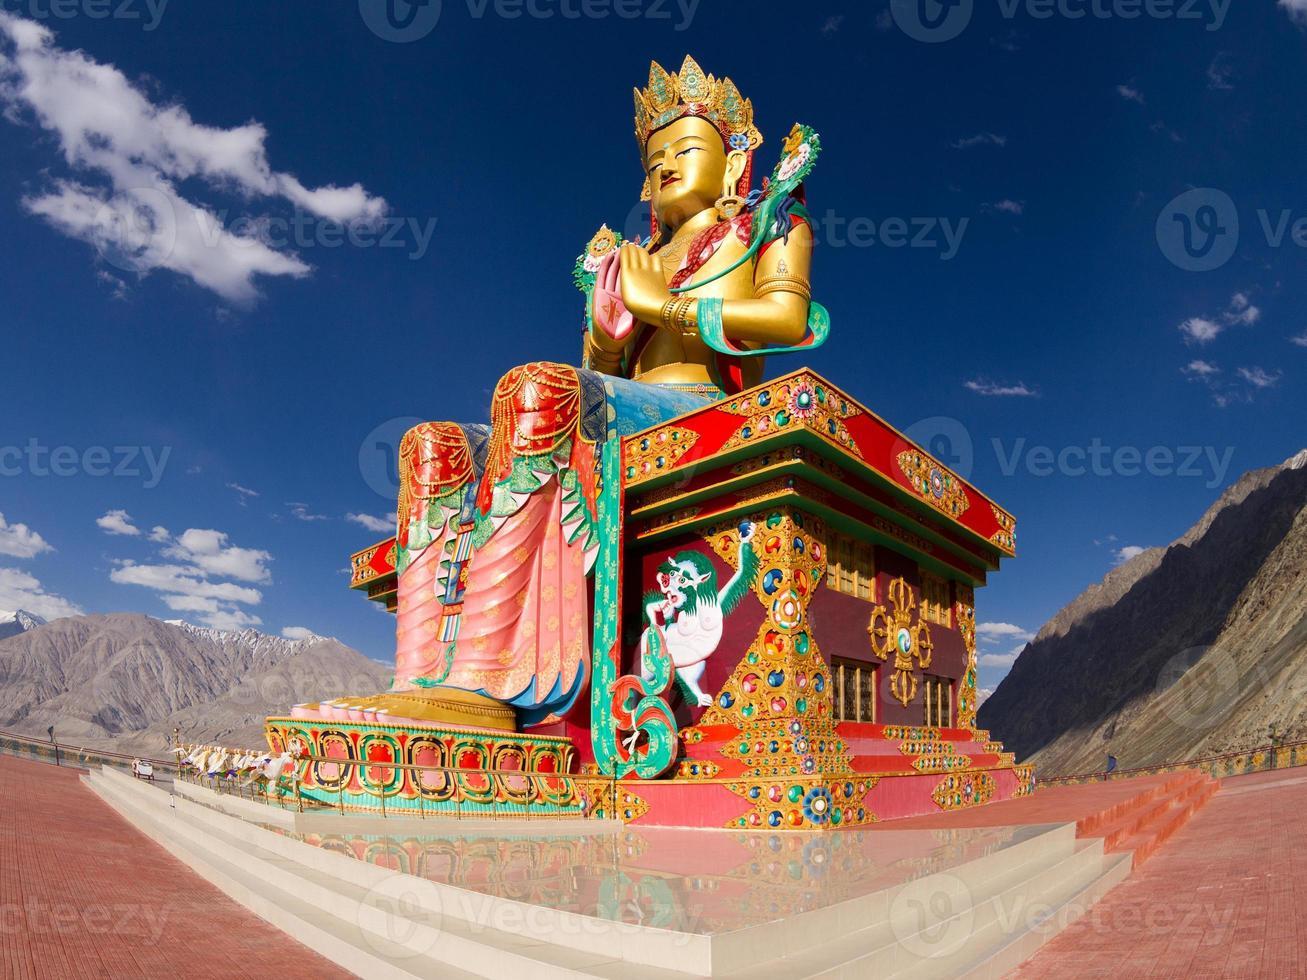 statue de Bouddha dans la vallée de la nubra photo